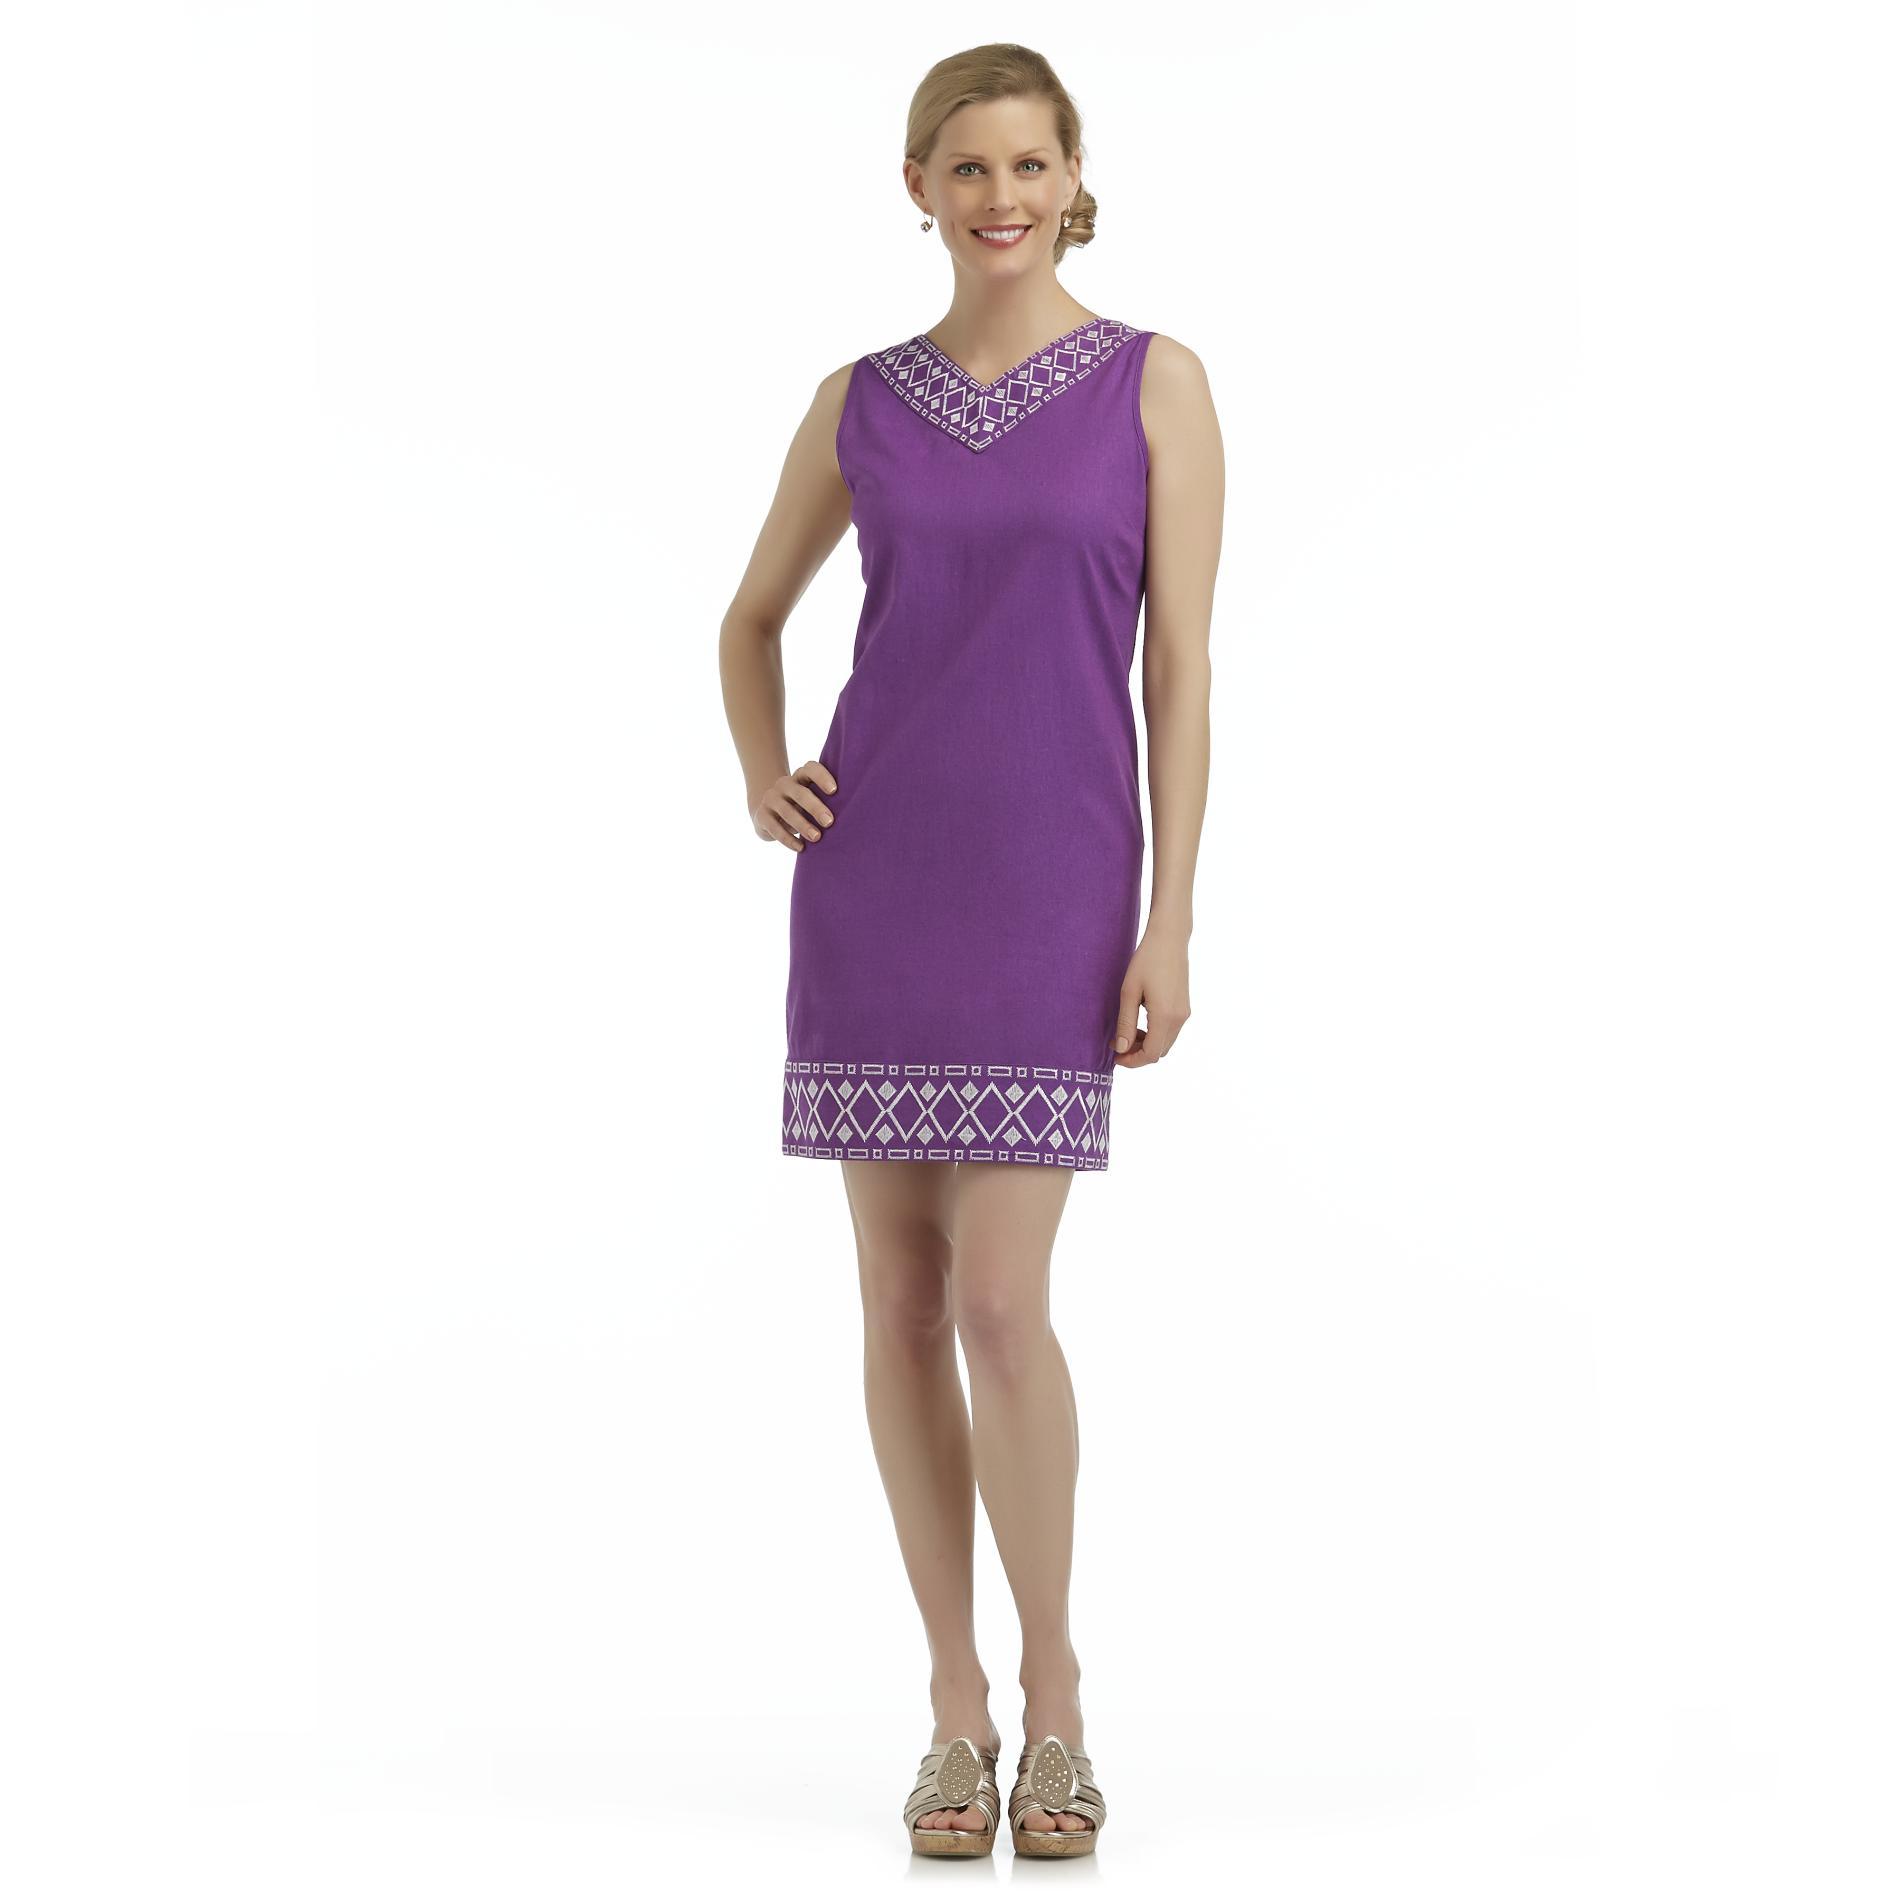 Womens DressesFind Dresses For Women at Kmart